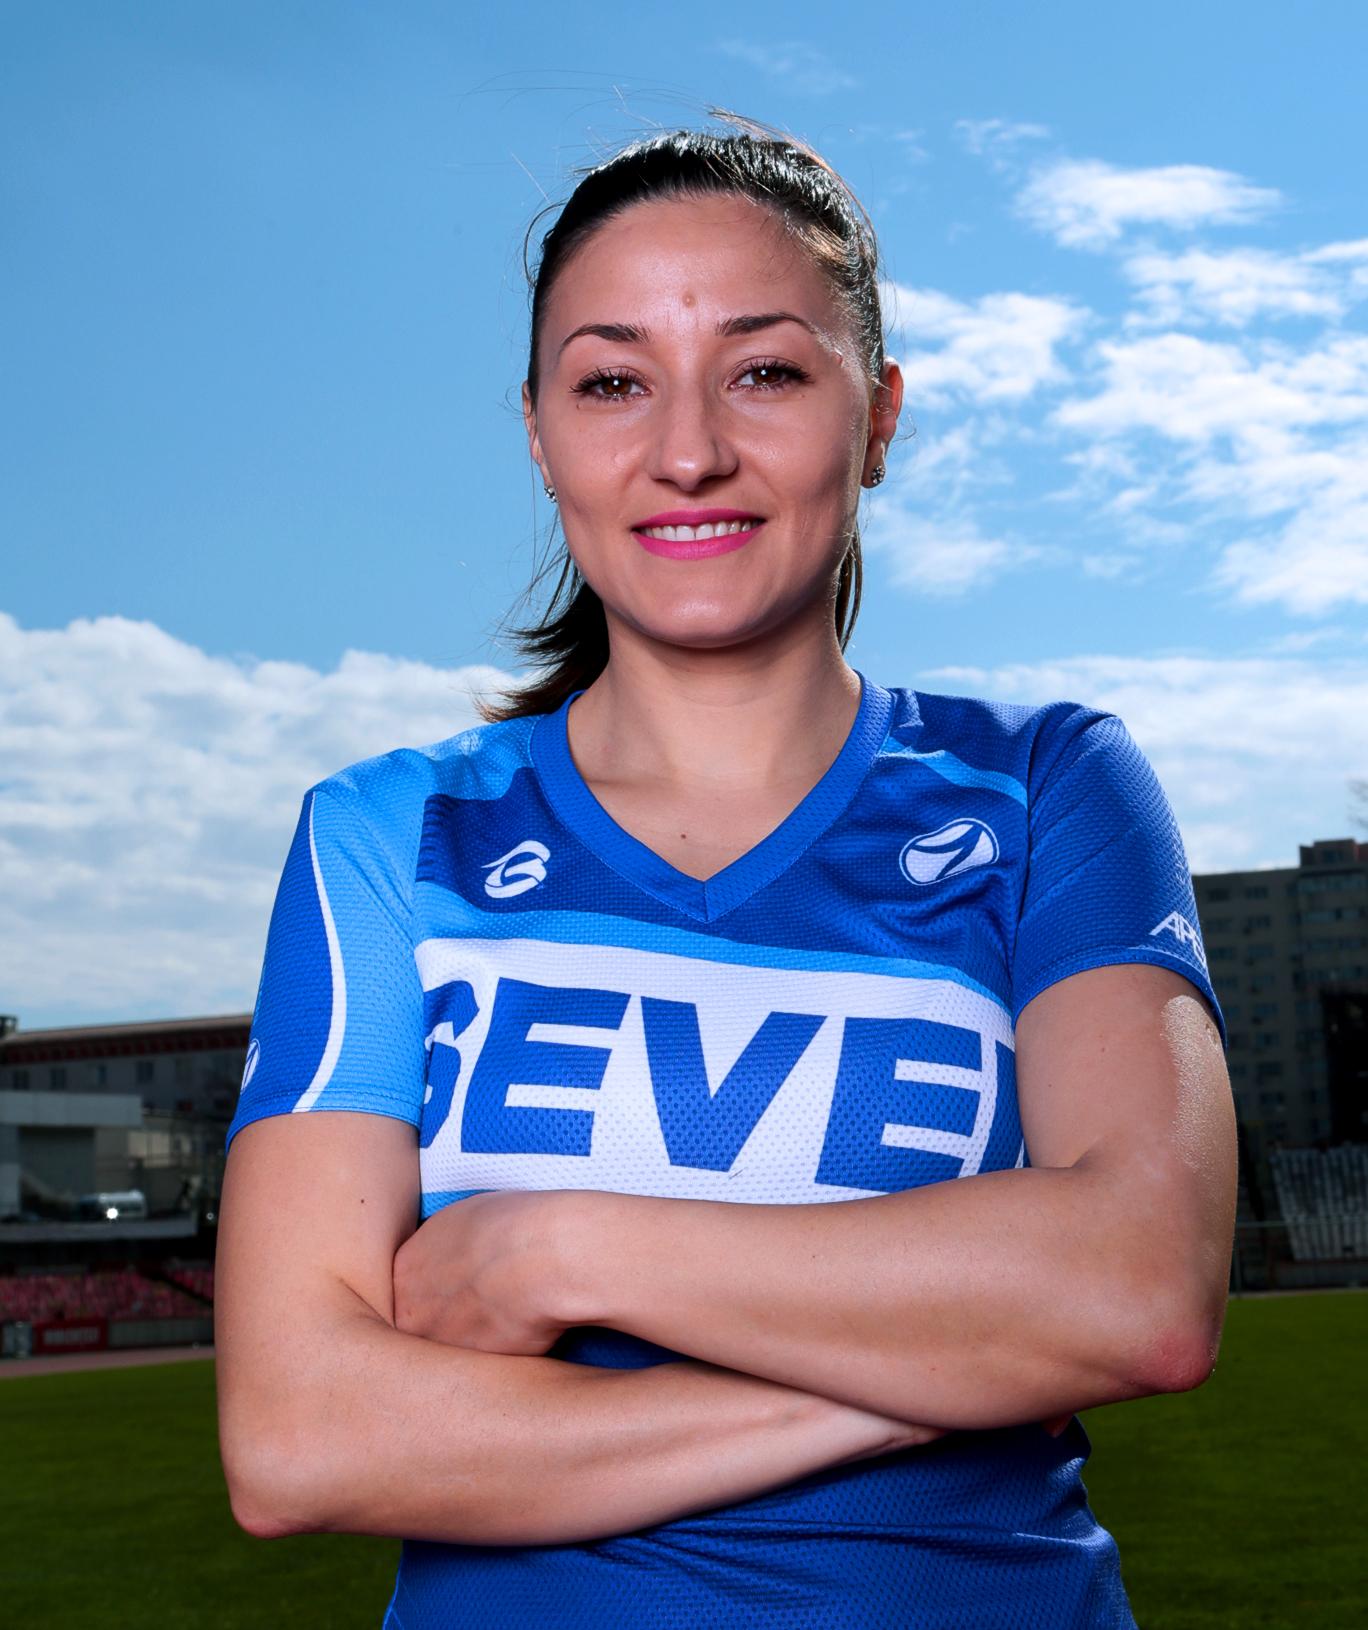 https://www.sevensportclub.ro/wp-content/uploads/2020/10/Antrenori_684x815_Florentina.jpg